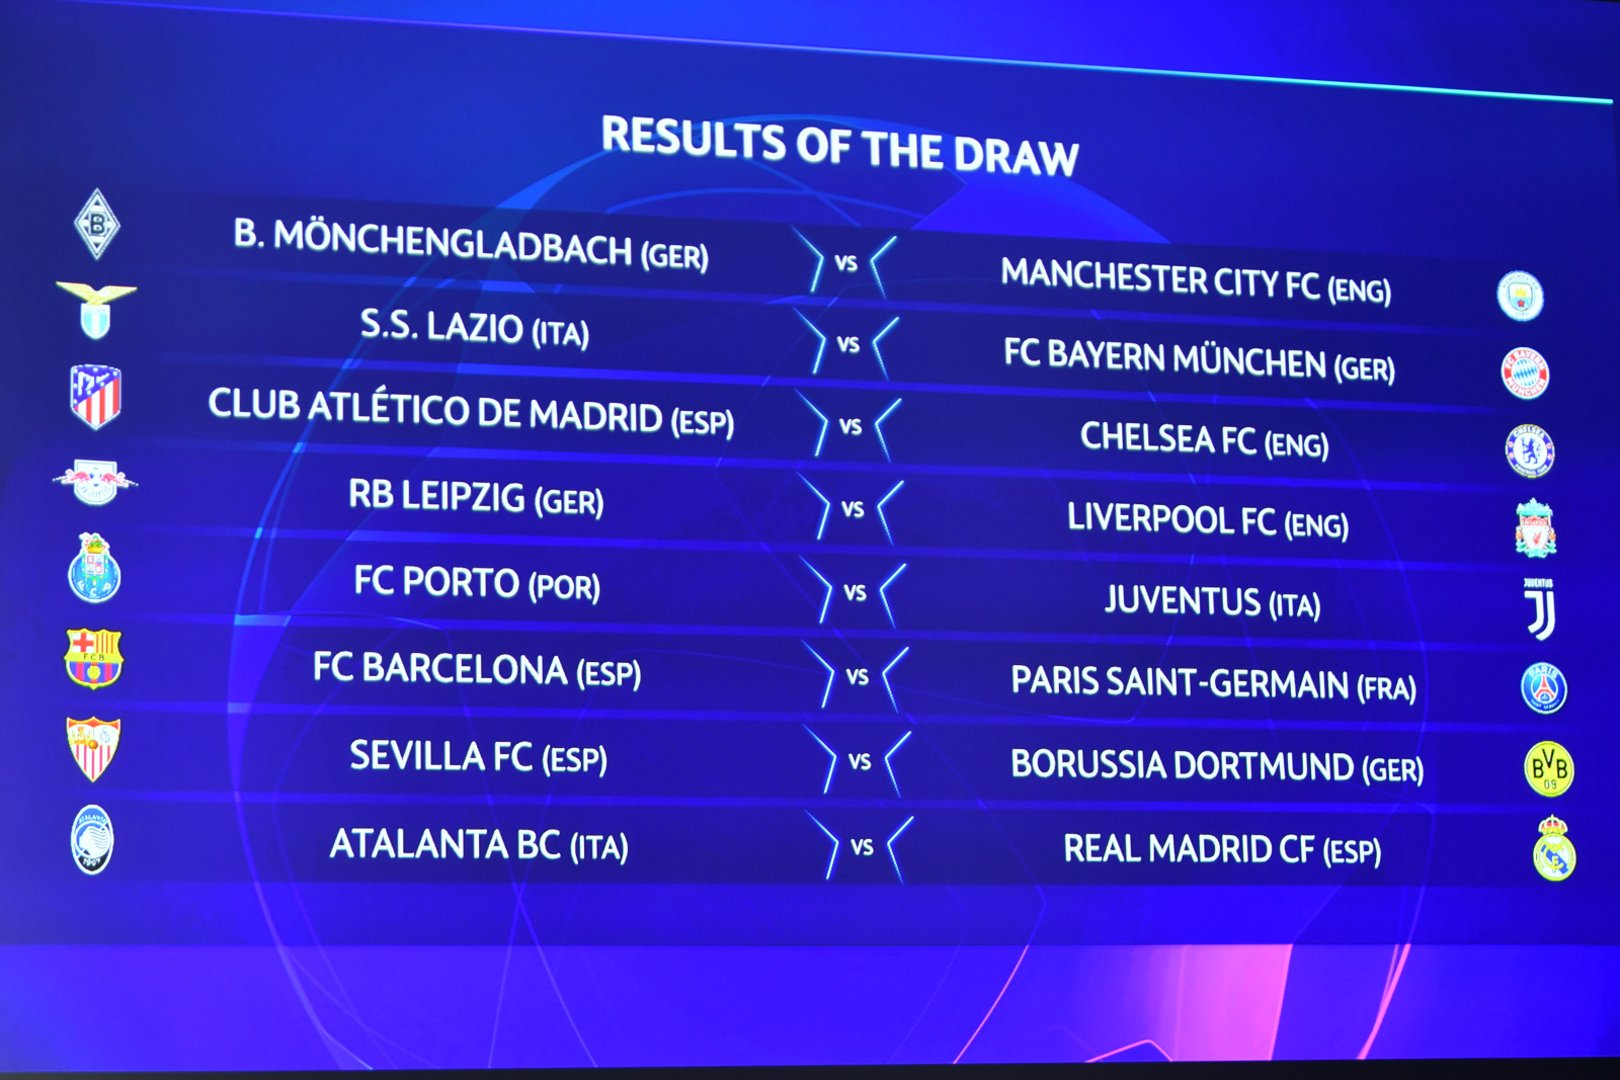 Champions League last-16 dates confirmed